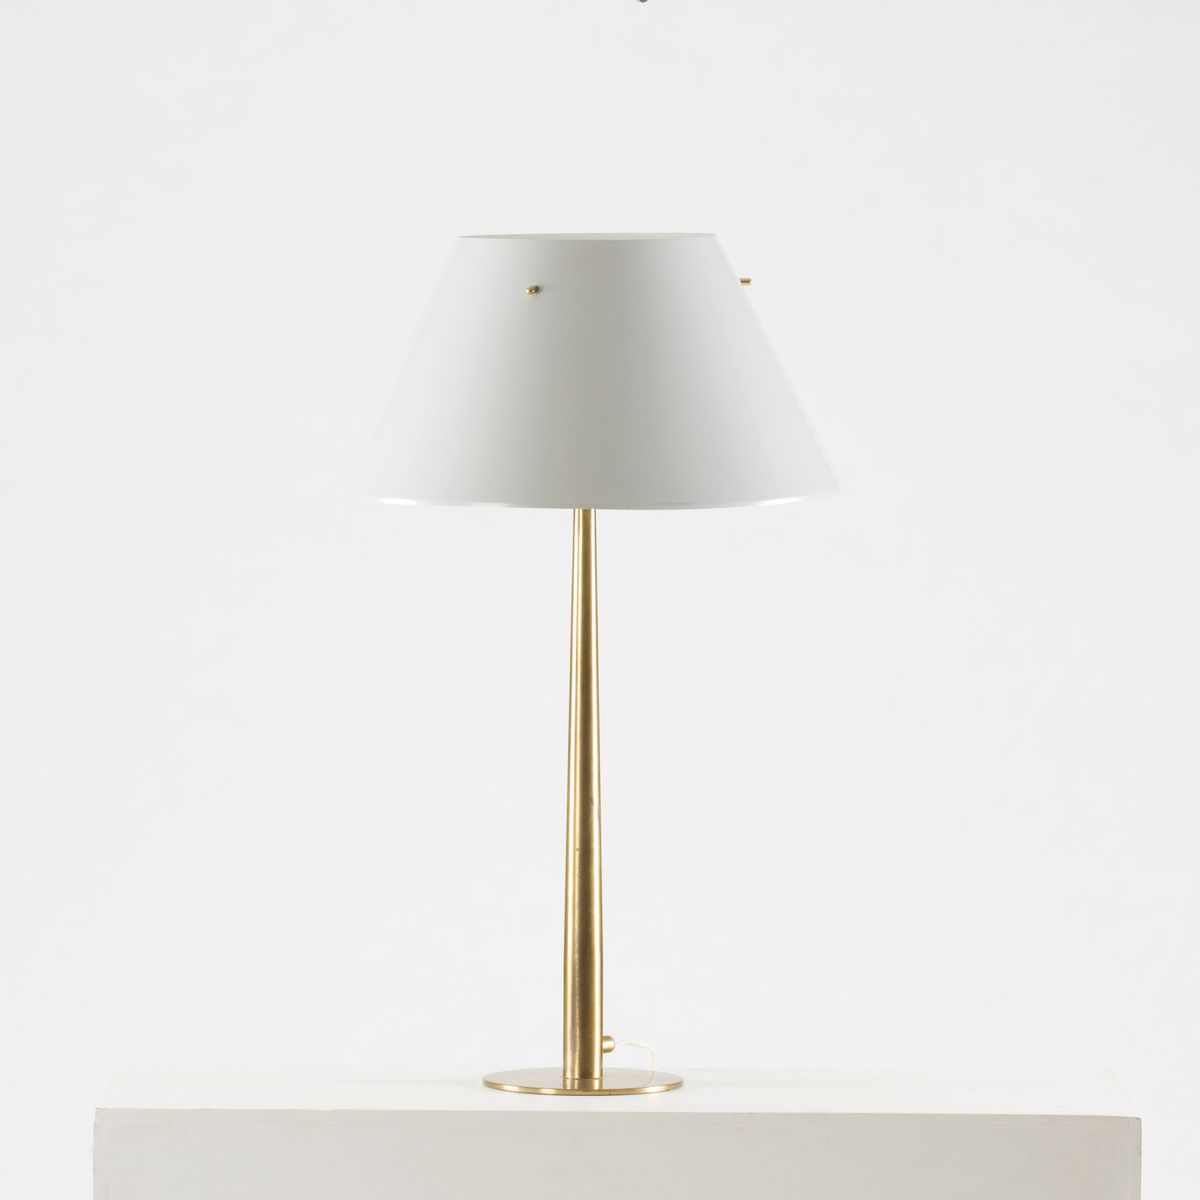 tischlampe aus messing metall von hans agne jakobsson. Black Bedroom Furniture Sets. Home Design Ideas